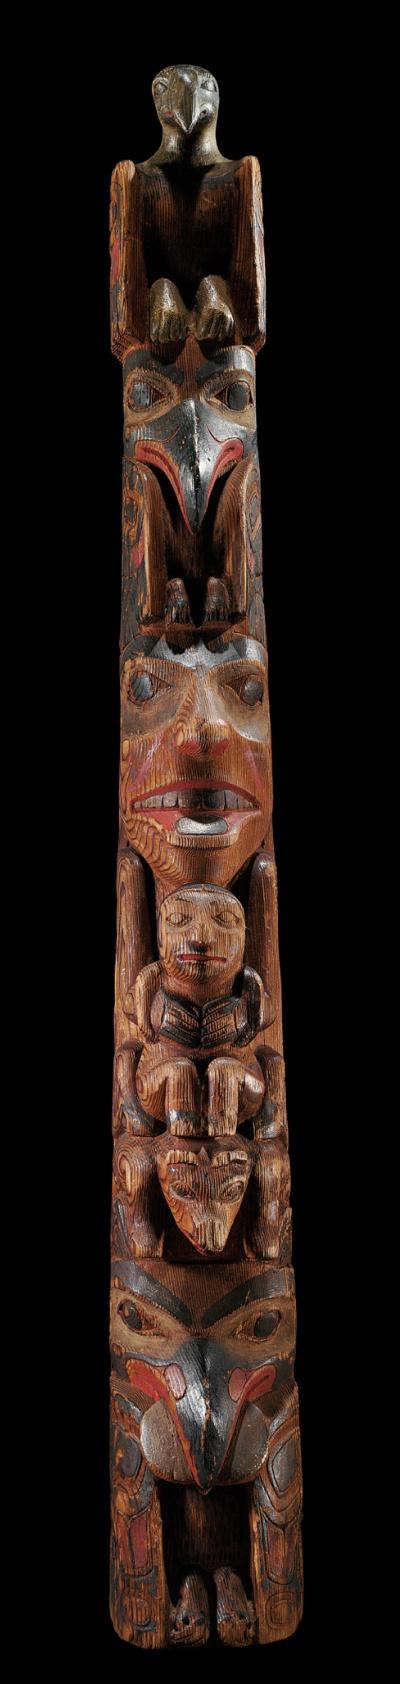 A Haïda model totem pole, carved by George Young, Northwest Coast